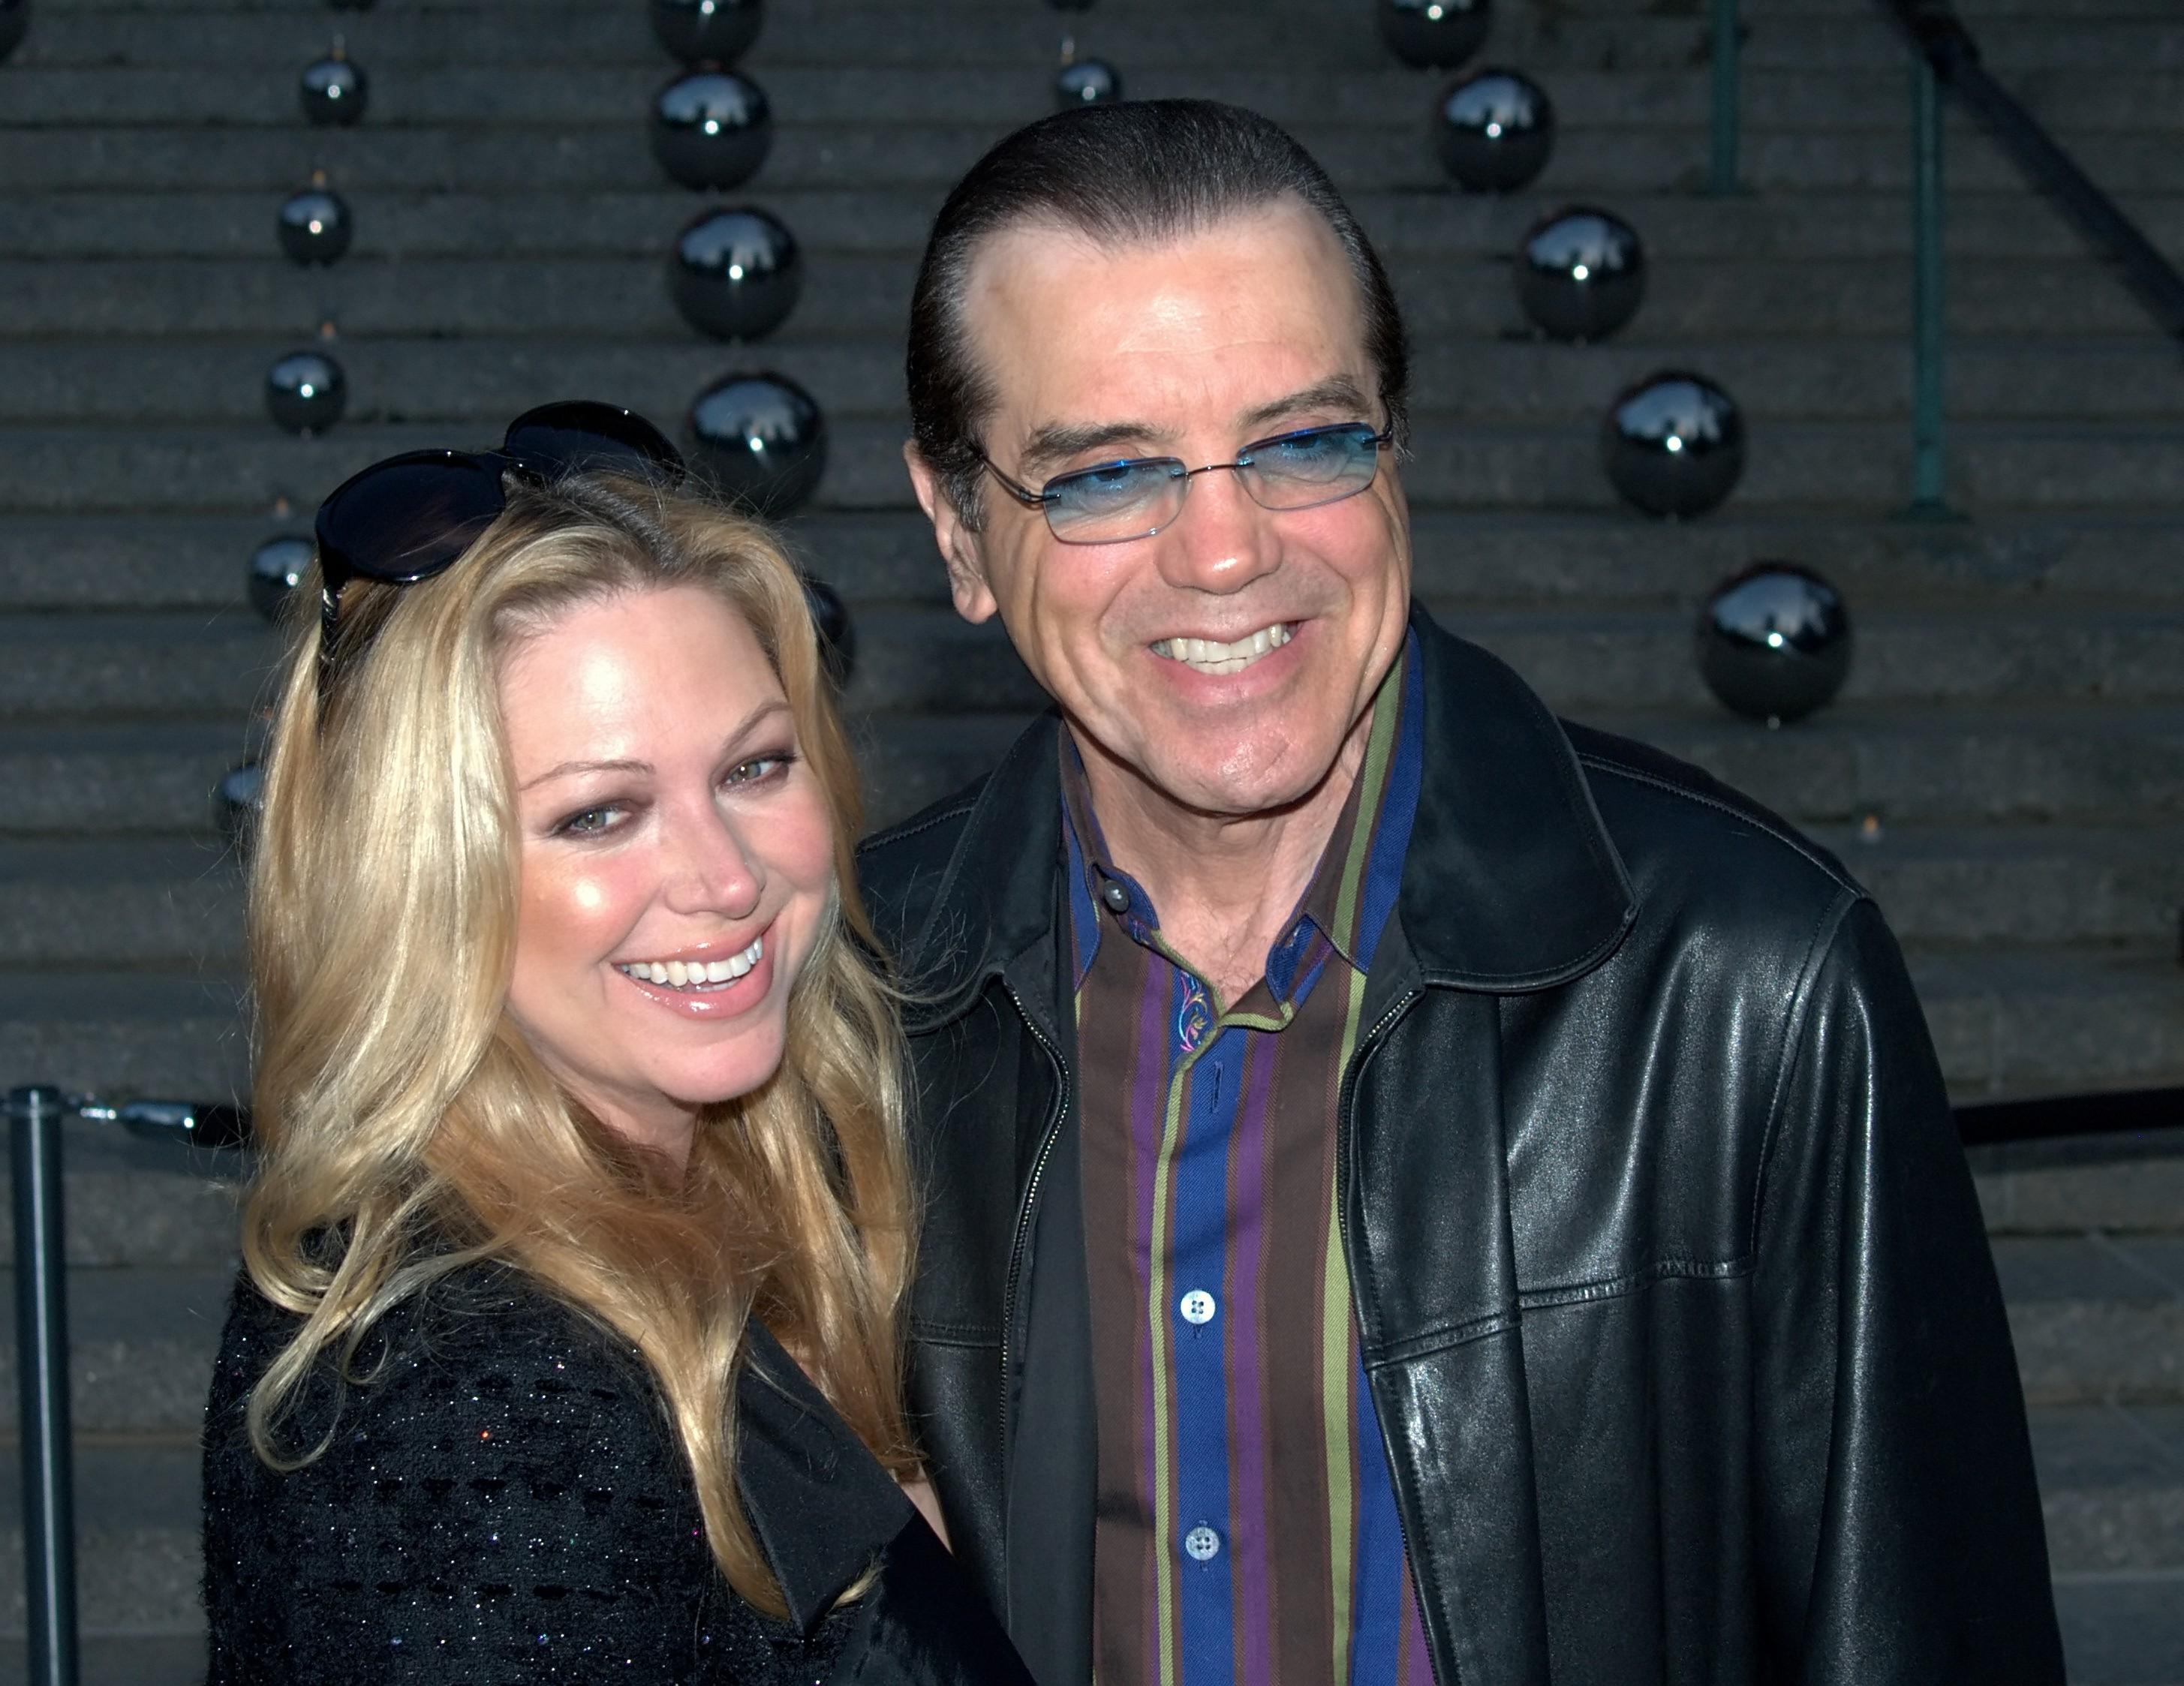 Chazz Palminteri with beautiful, sweet, Wife  Gianna Ranaudo